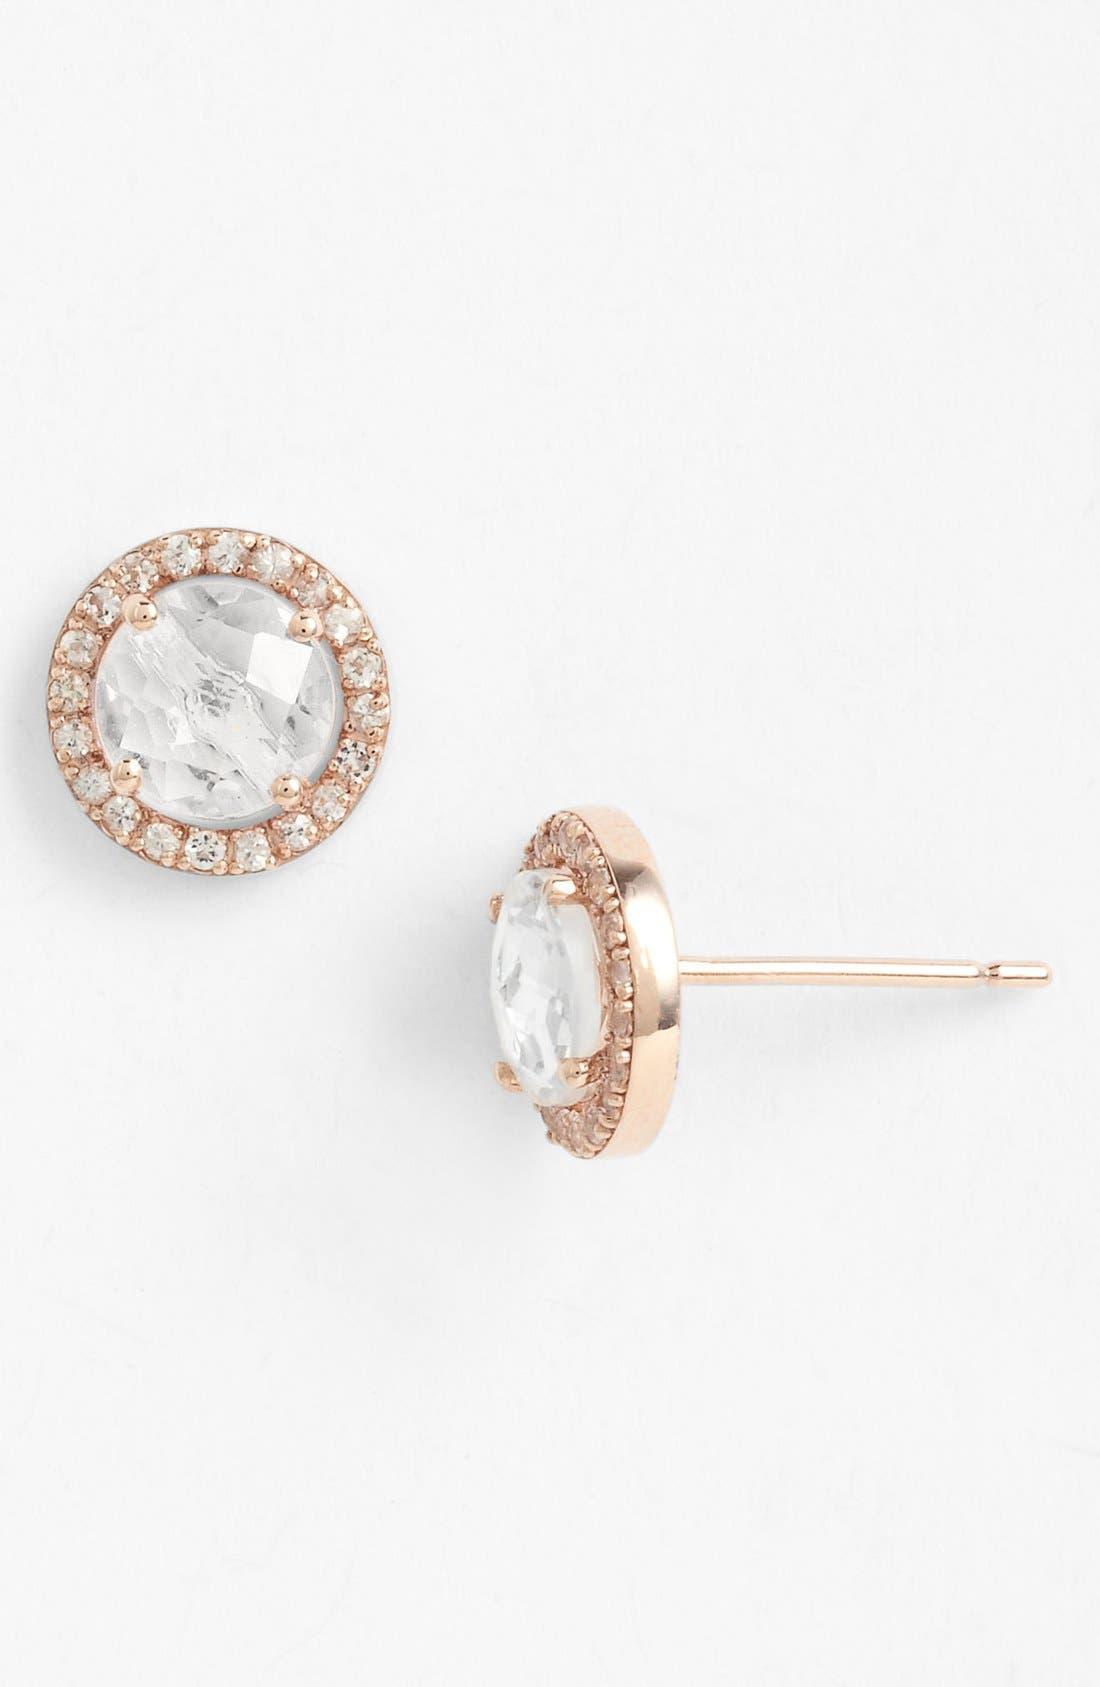 Main Image - KALAN by Suzanne Kalan Round Sapphire Bezel Earrings